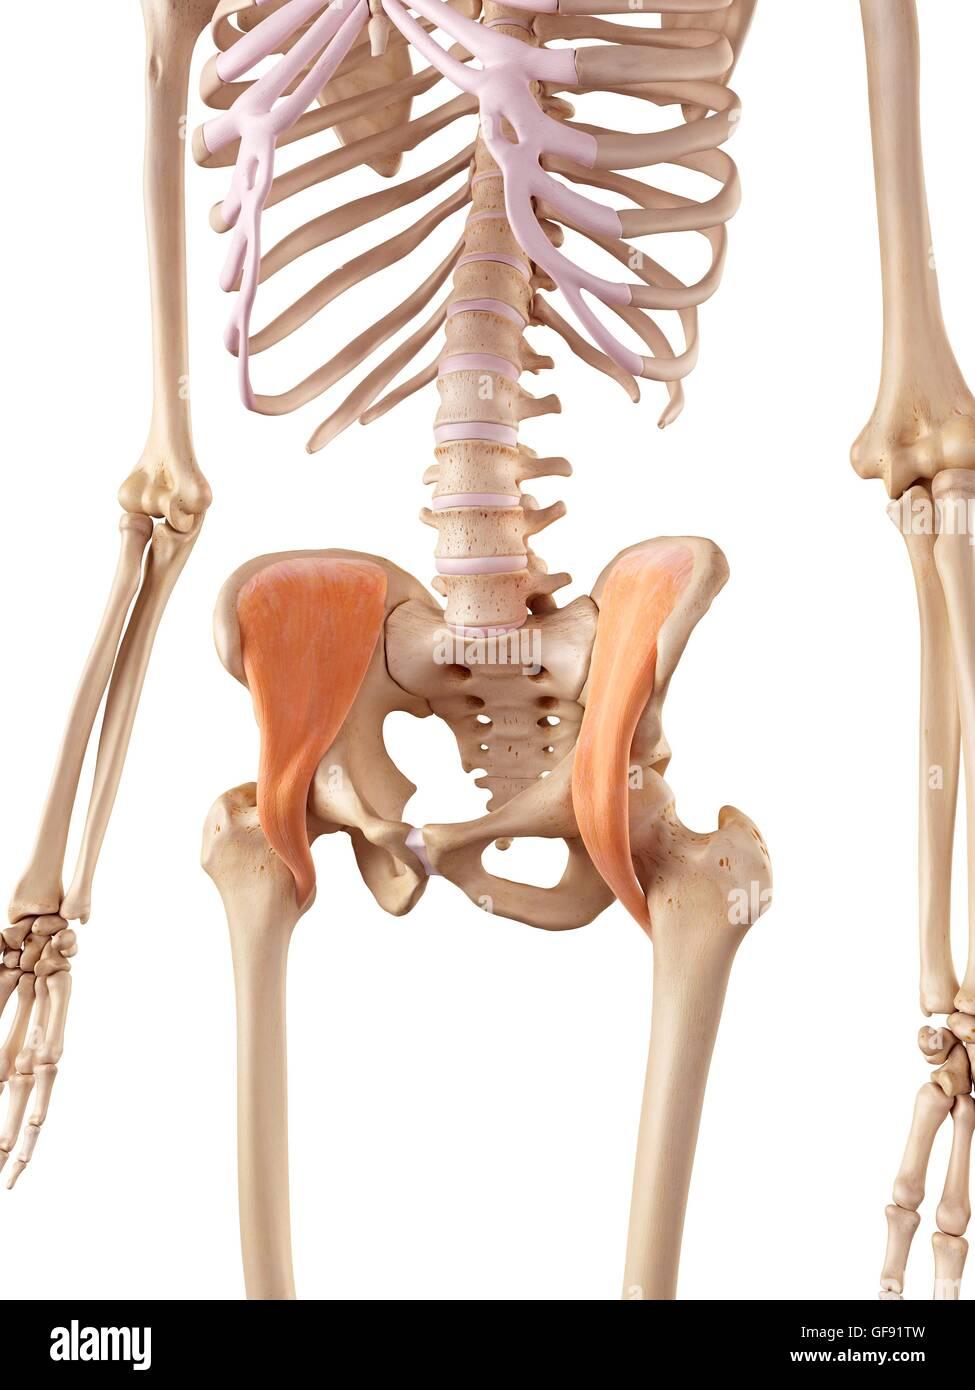 Human pelvic muscles, illustration. - Stock Image